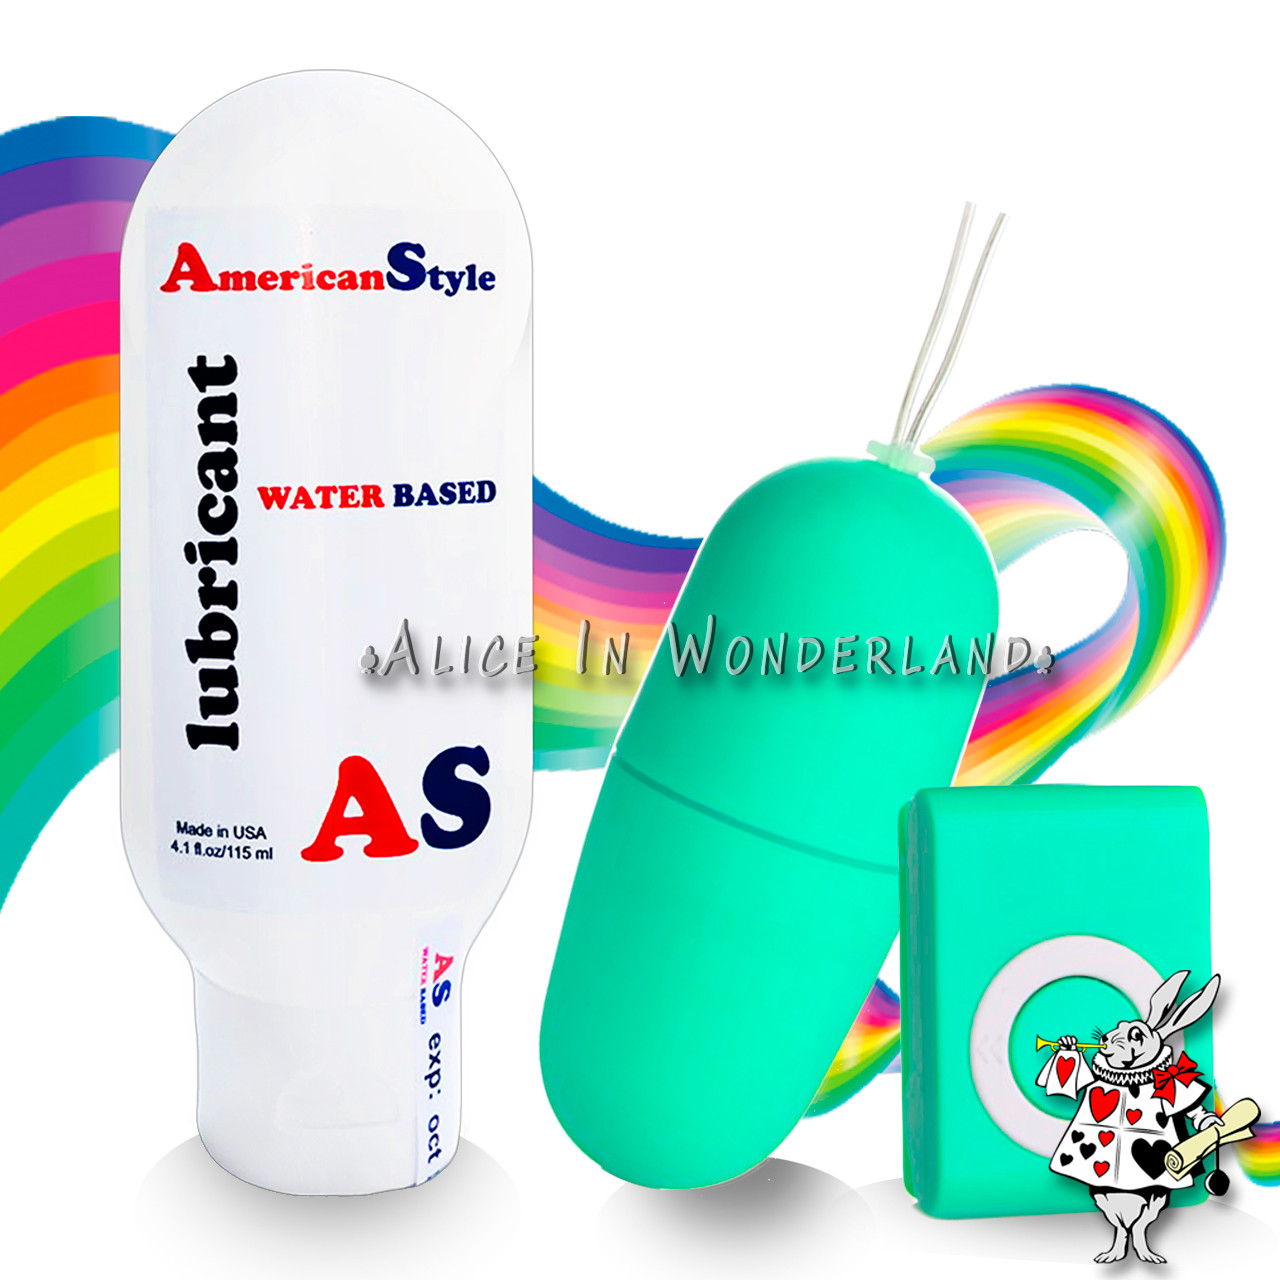 Лубрикант на водной основе American Style 115ml + мини вибратор женский бирюзового цвета